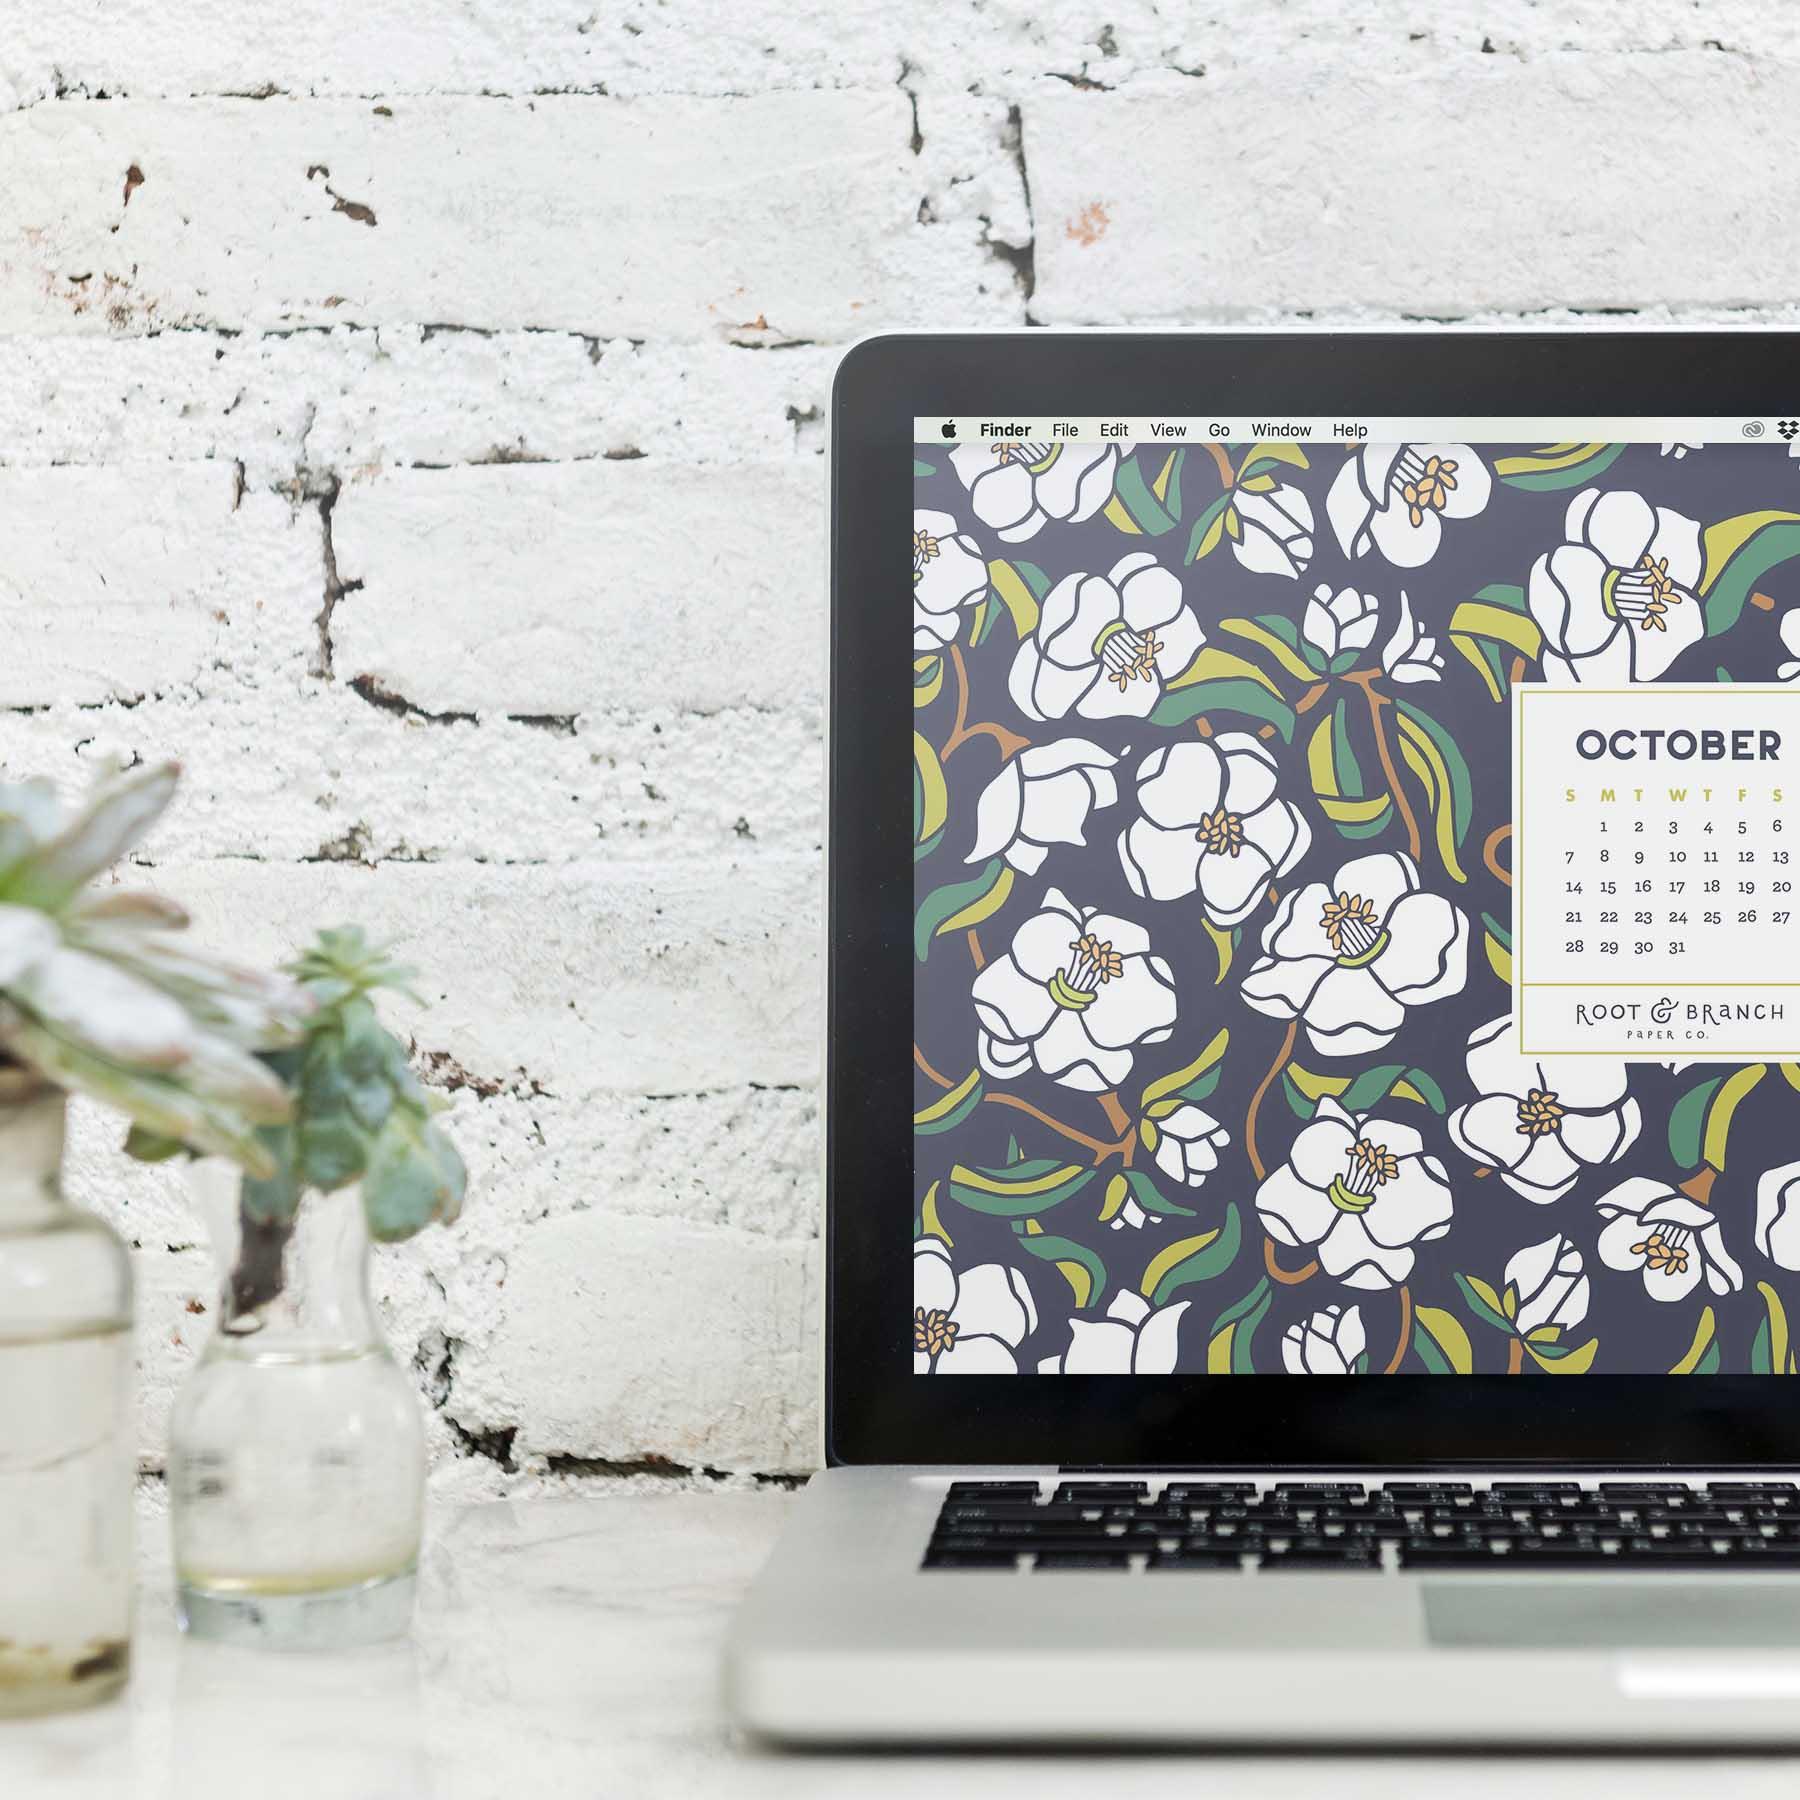 October 2018 Calendar — Root & Branch